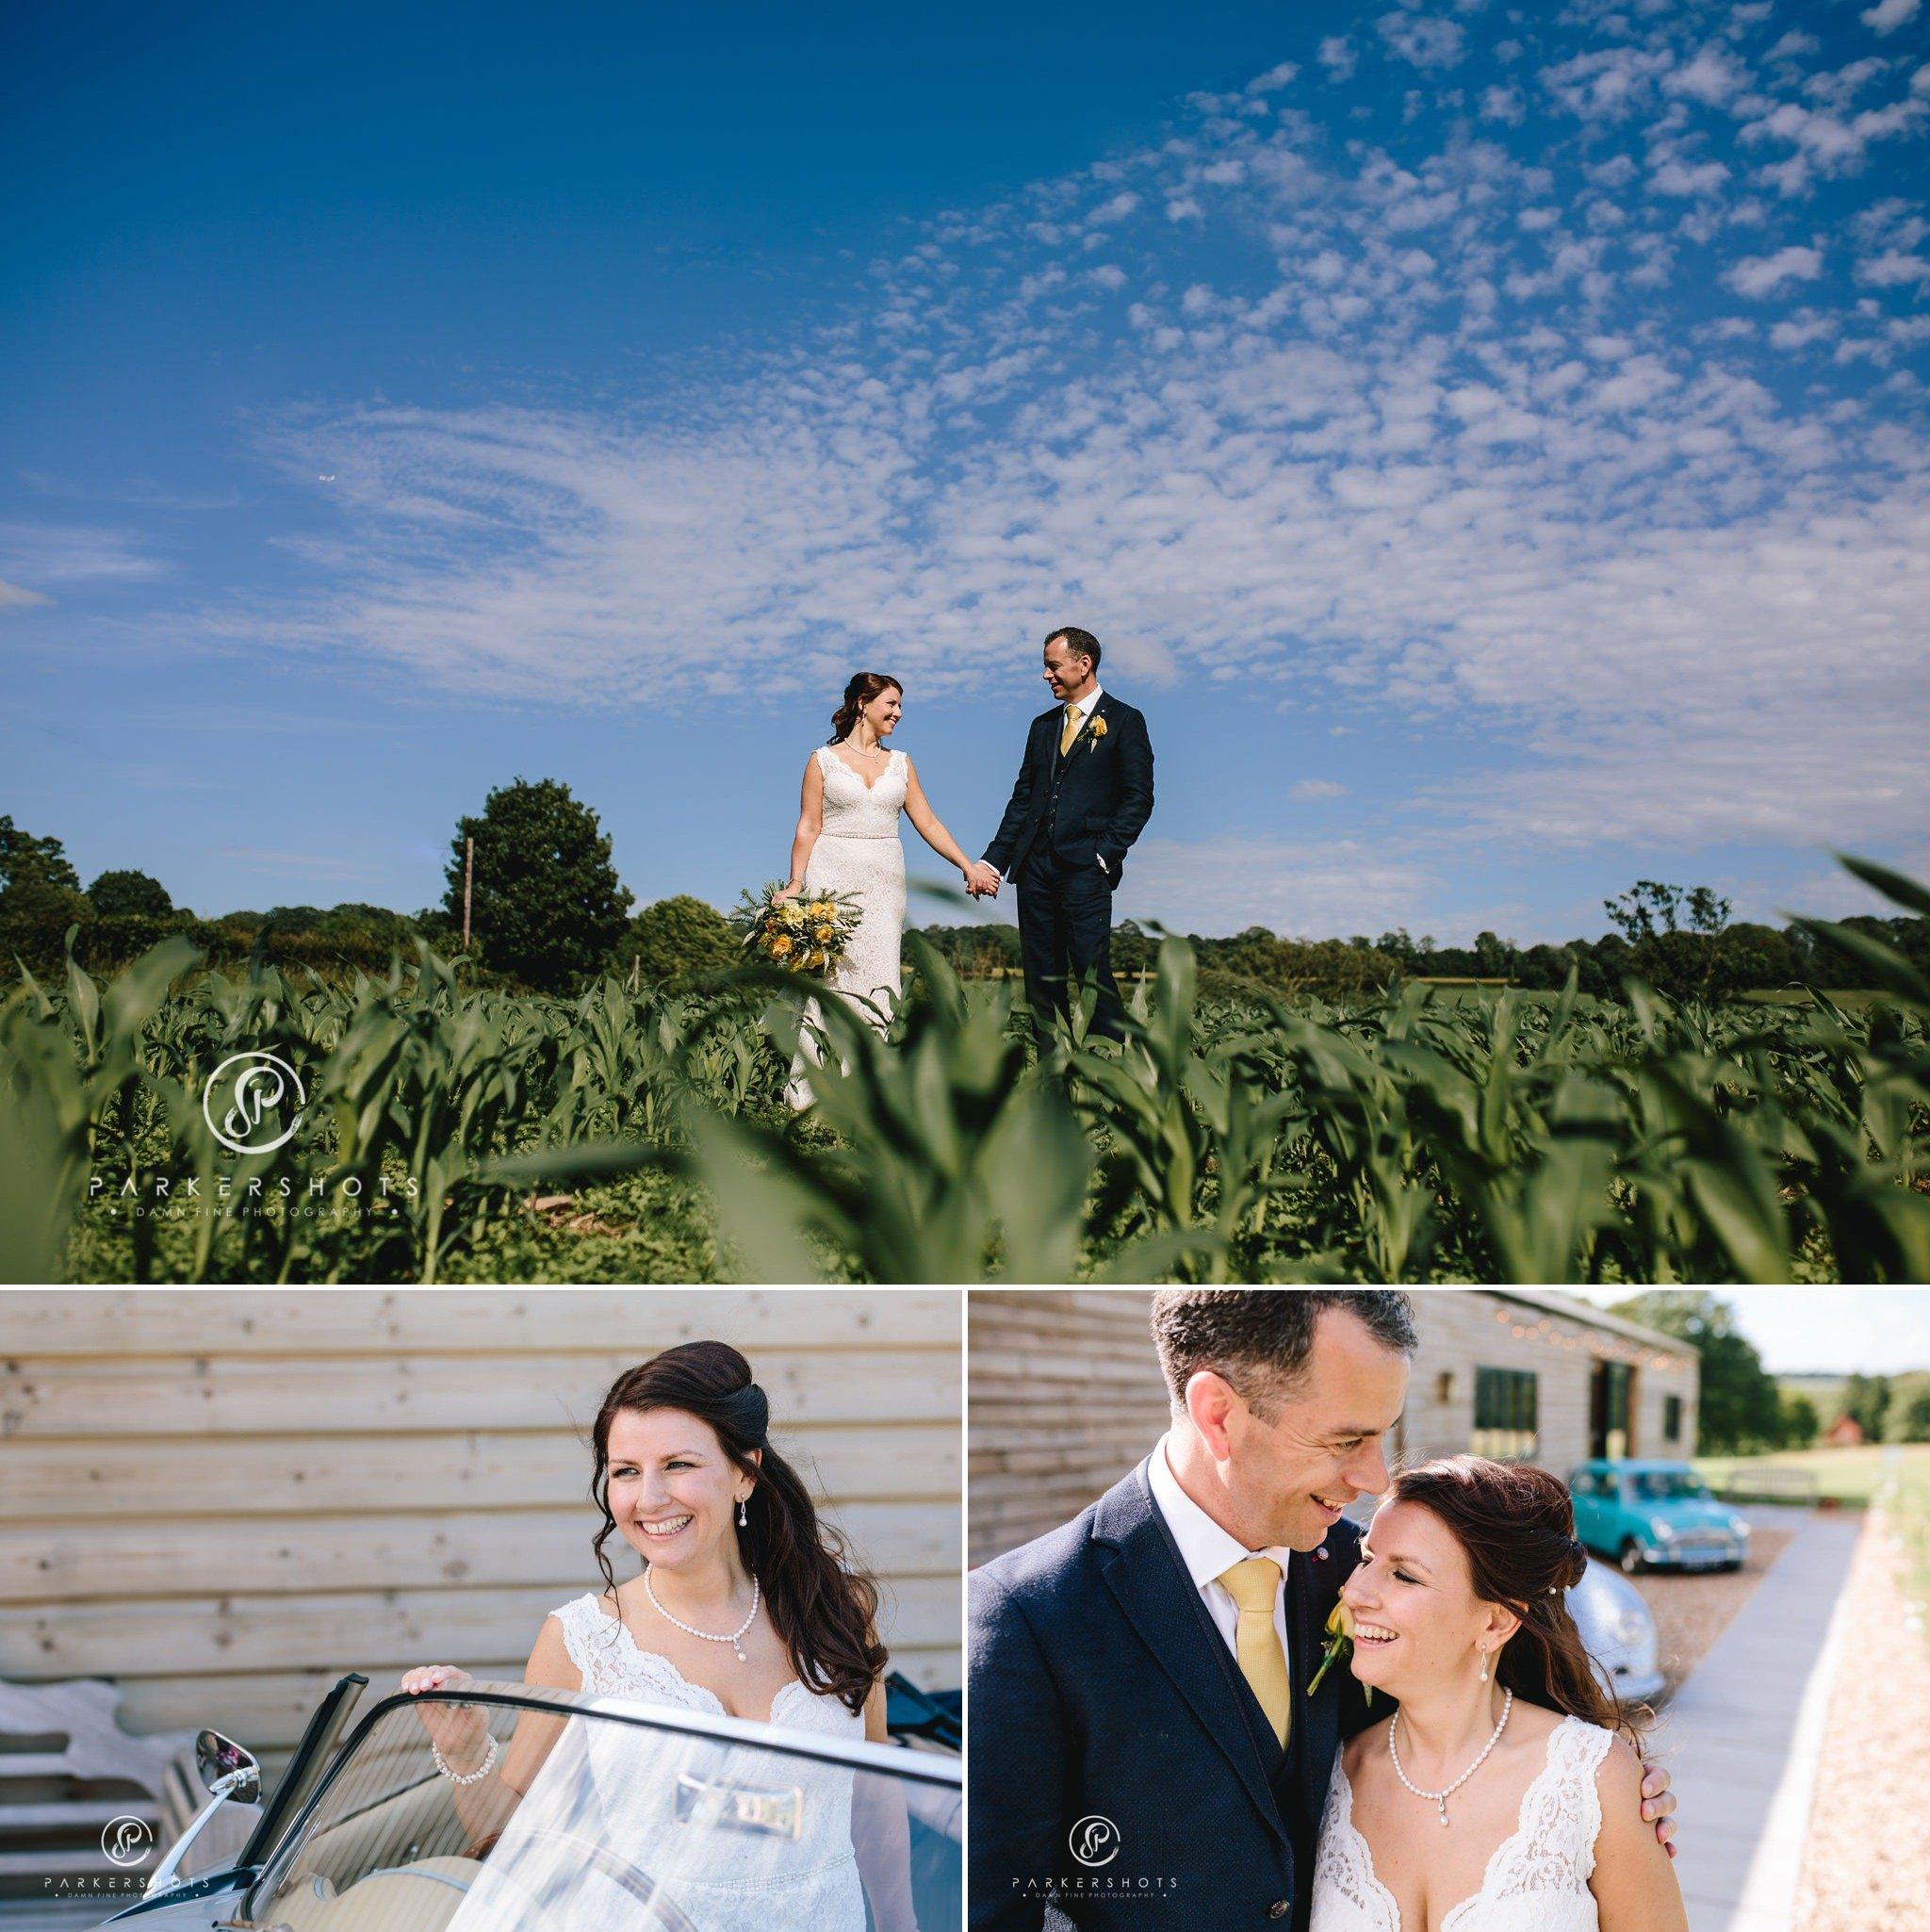 Chafford Park Wedding Photographer